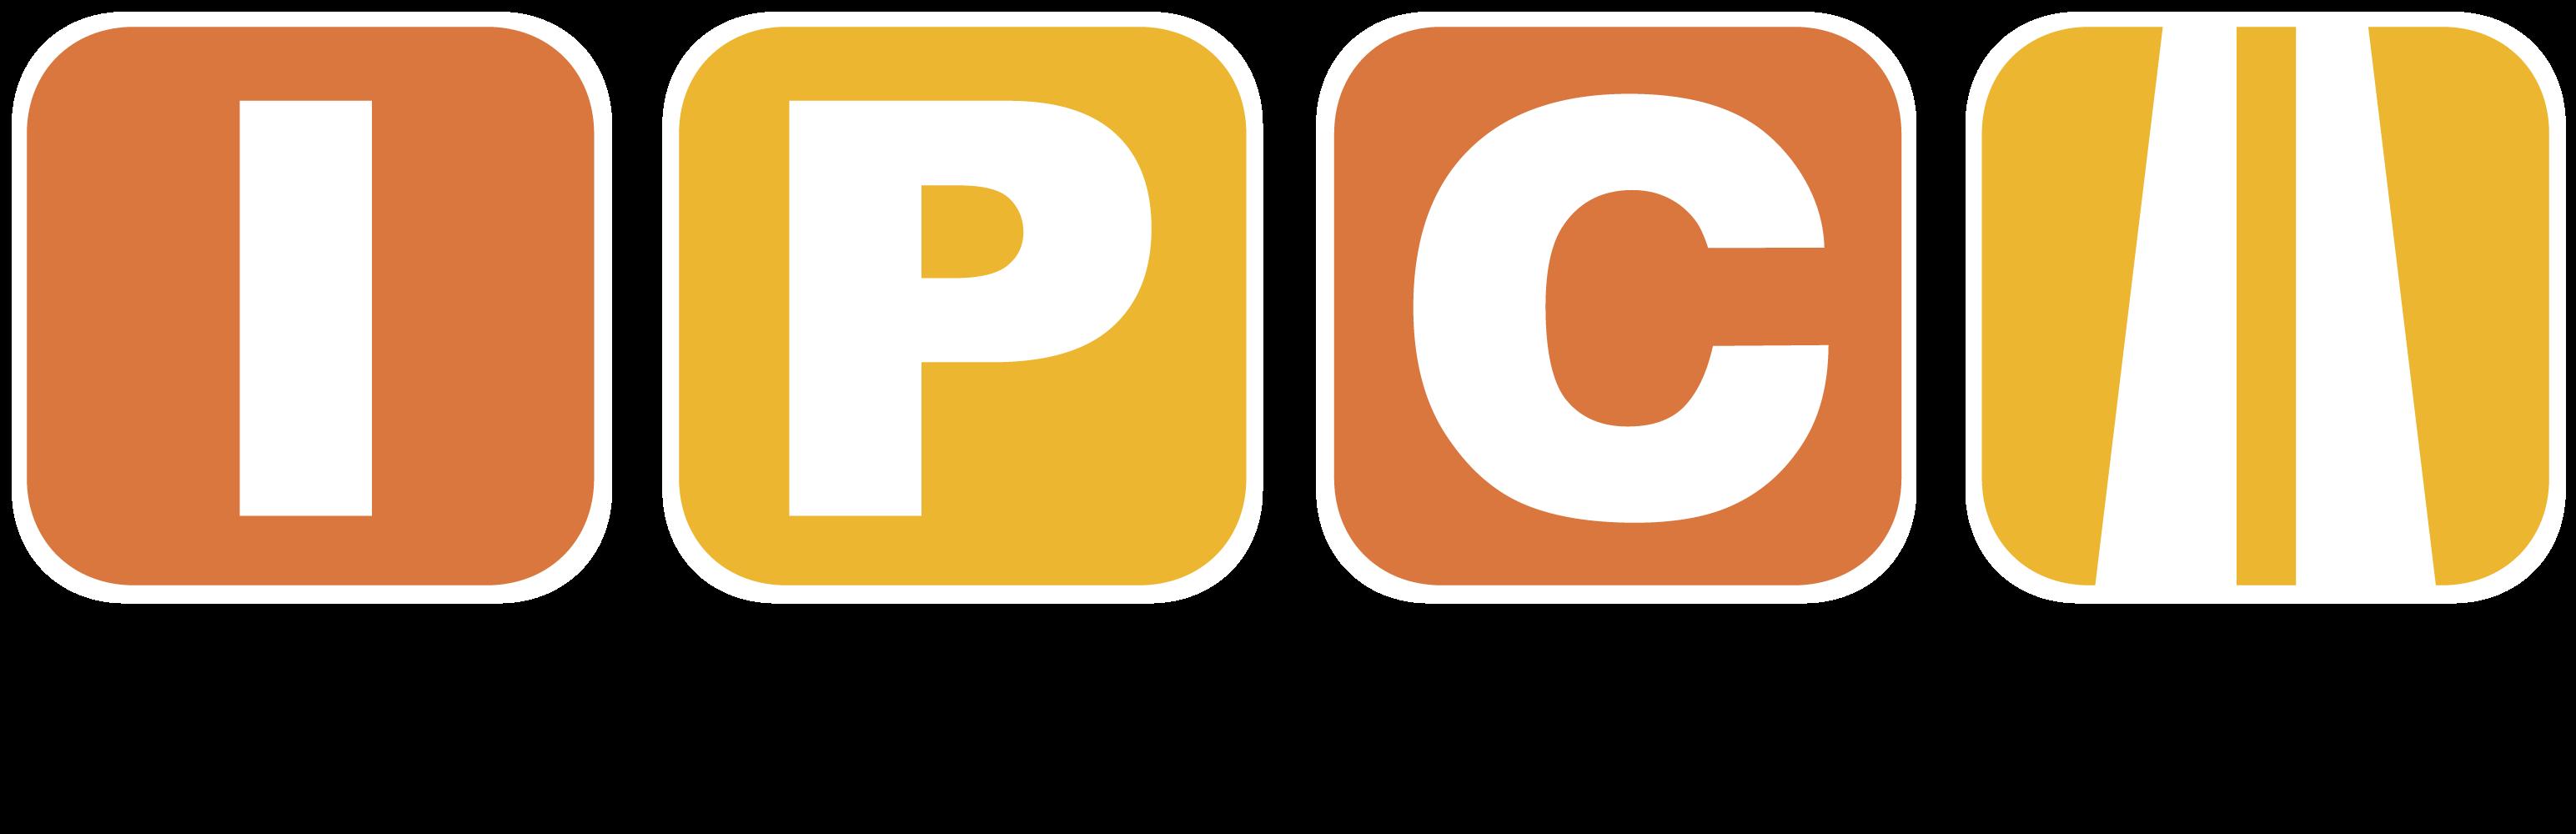 International parking community